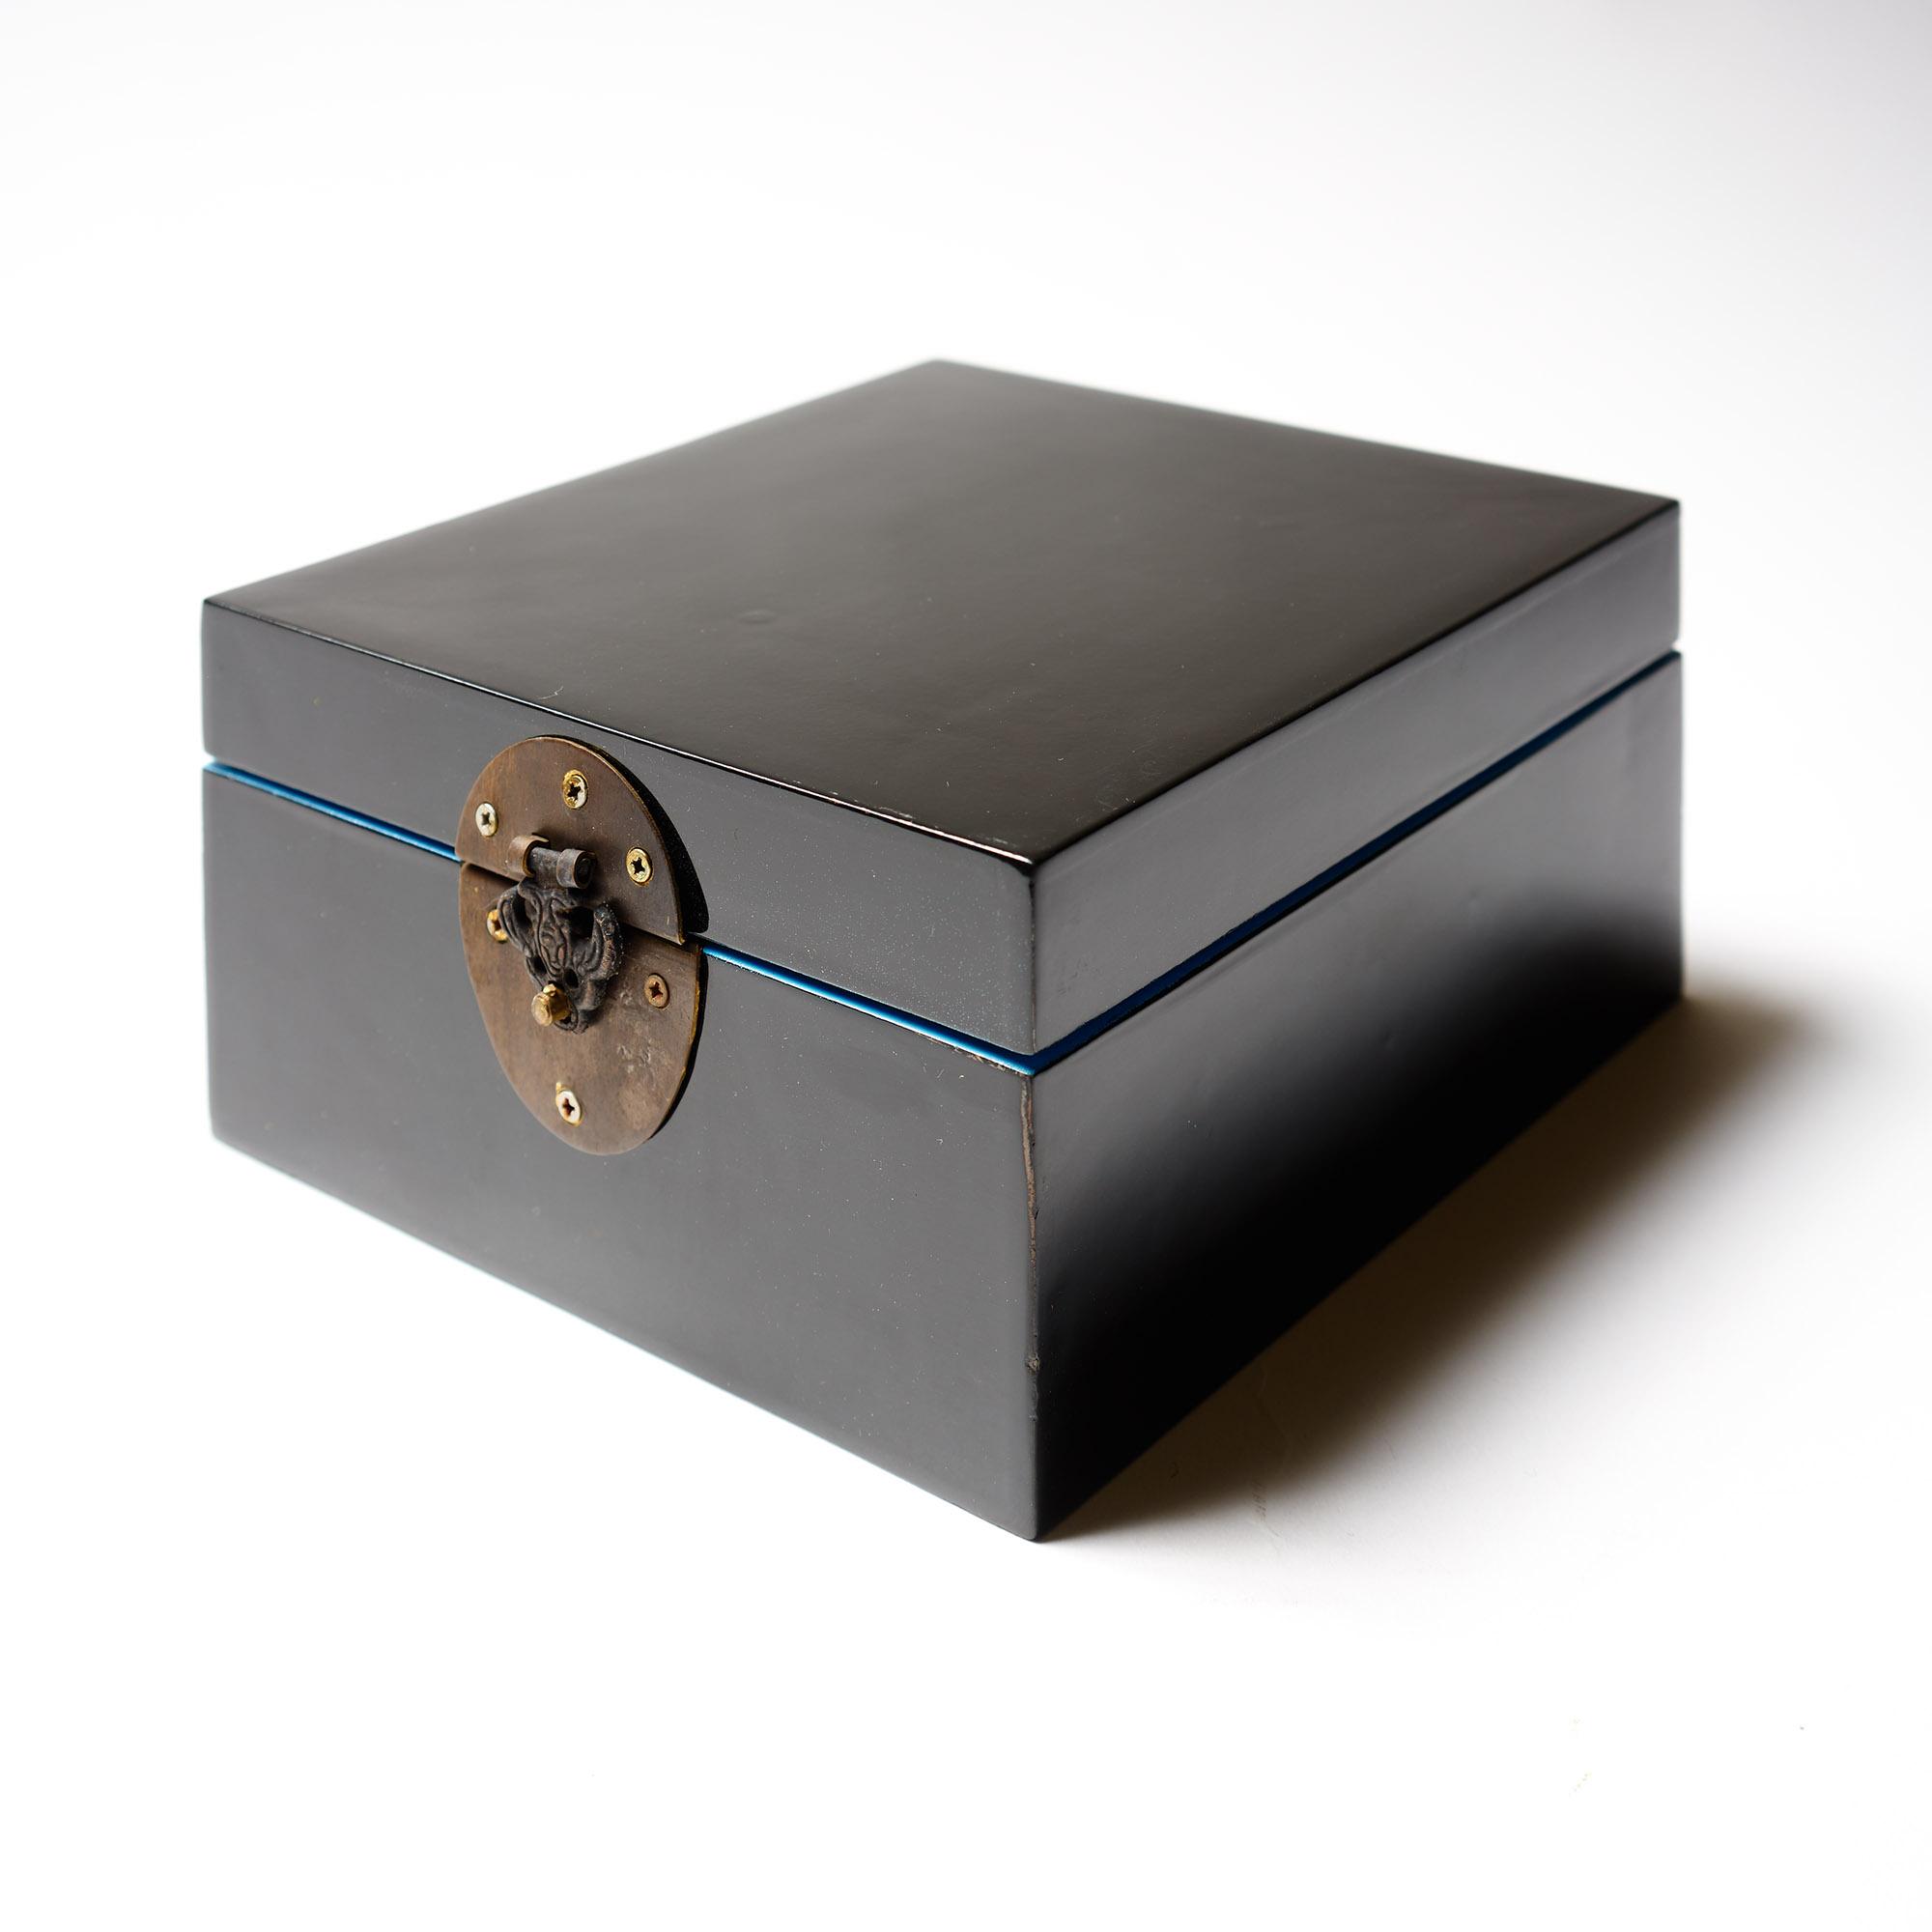 Caja laca negra y celeste